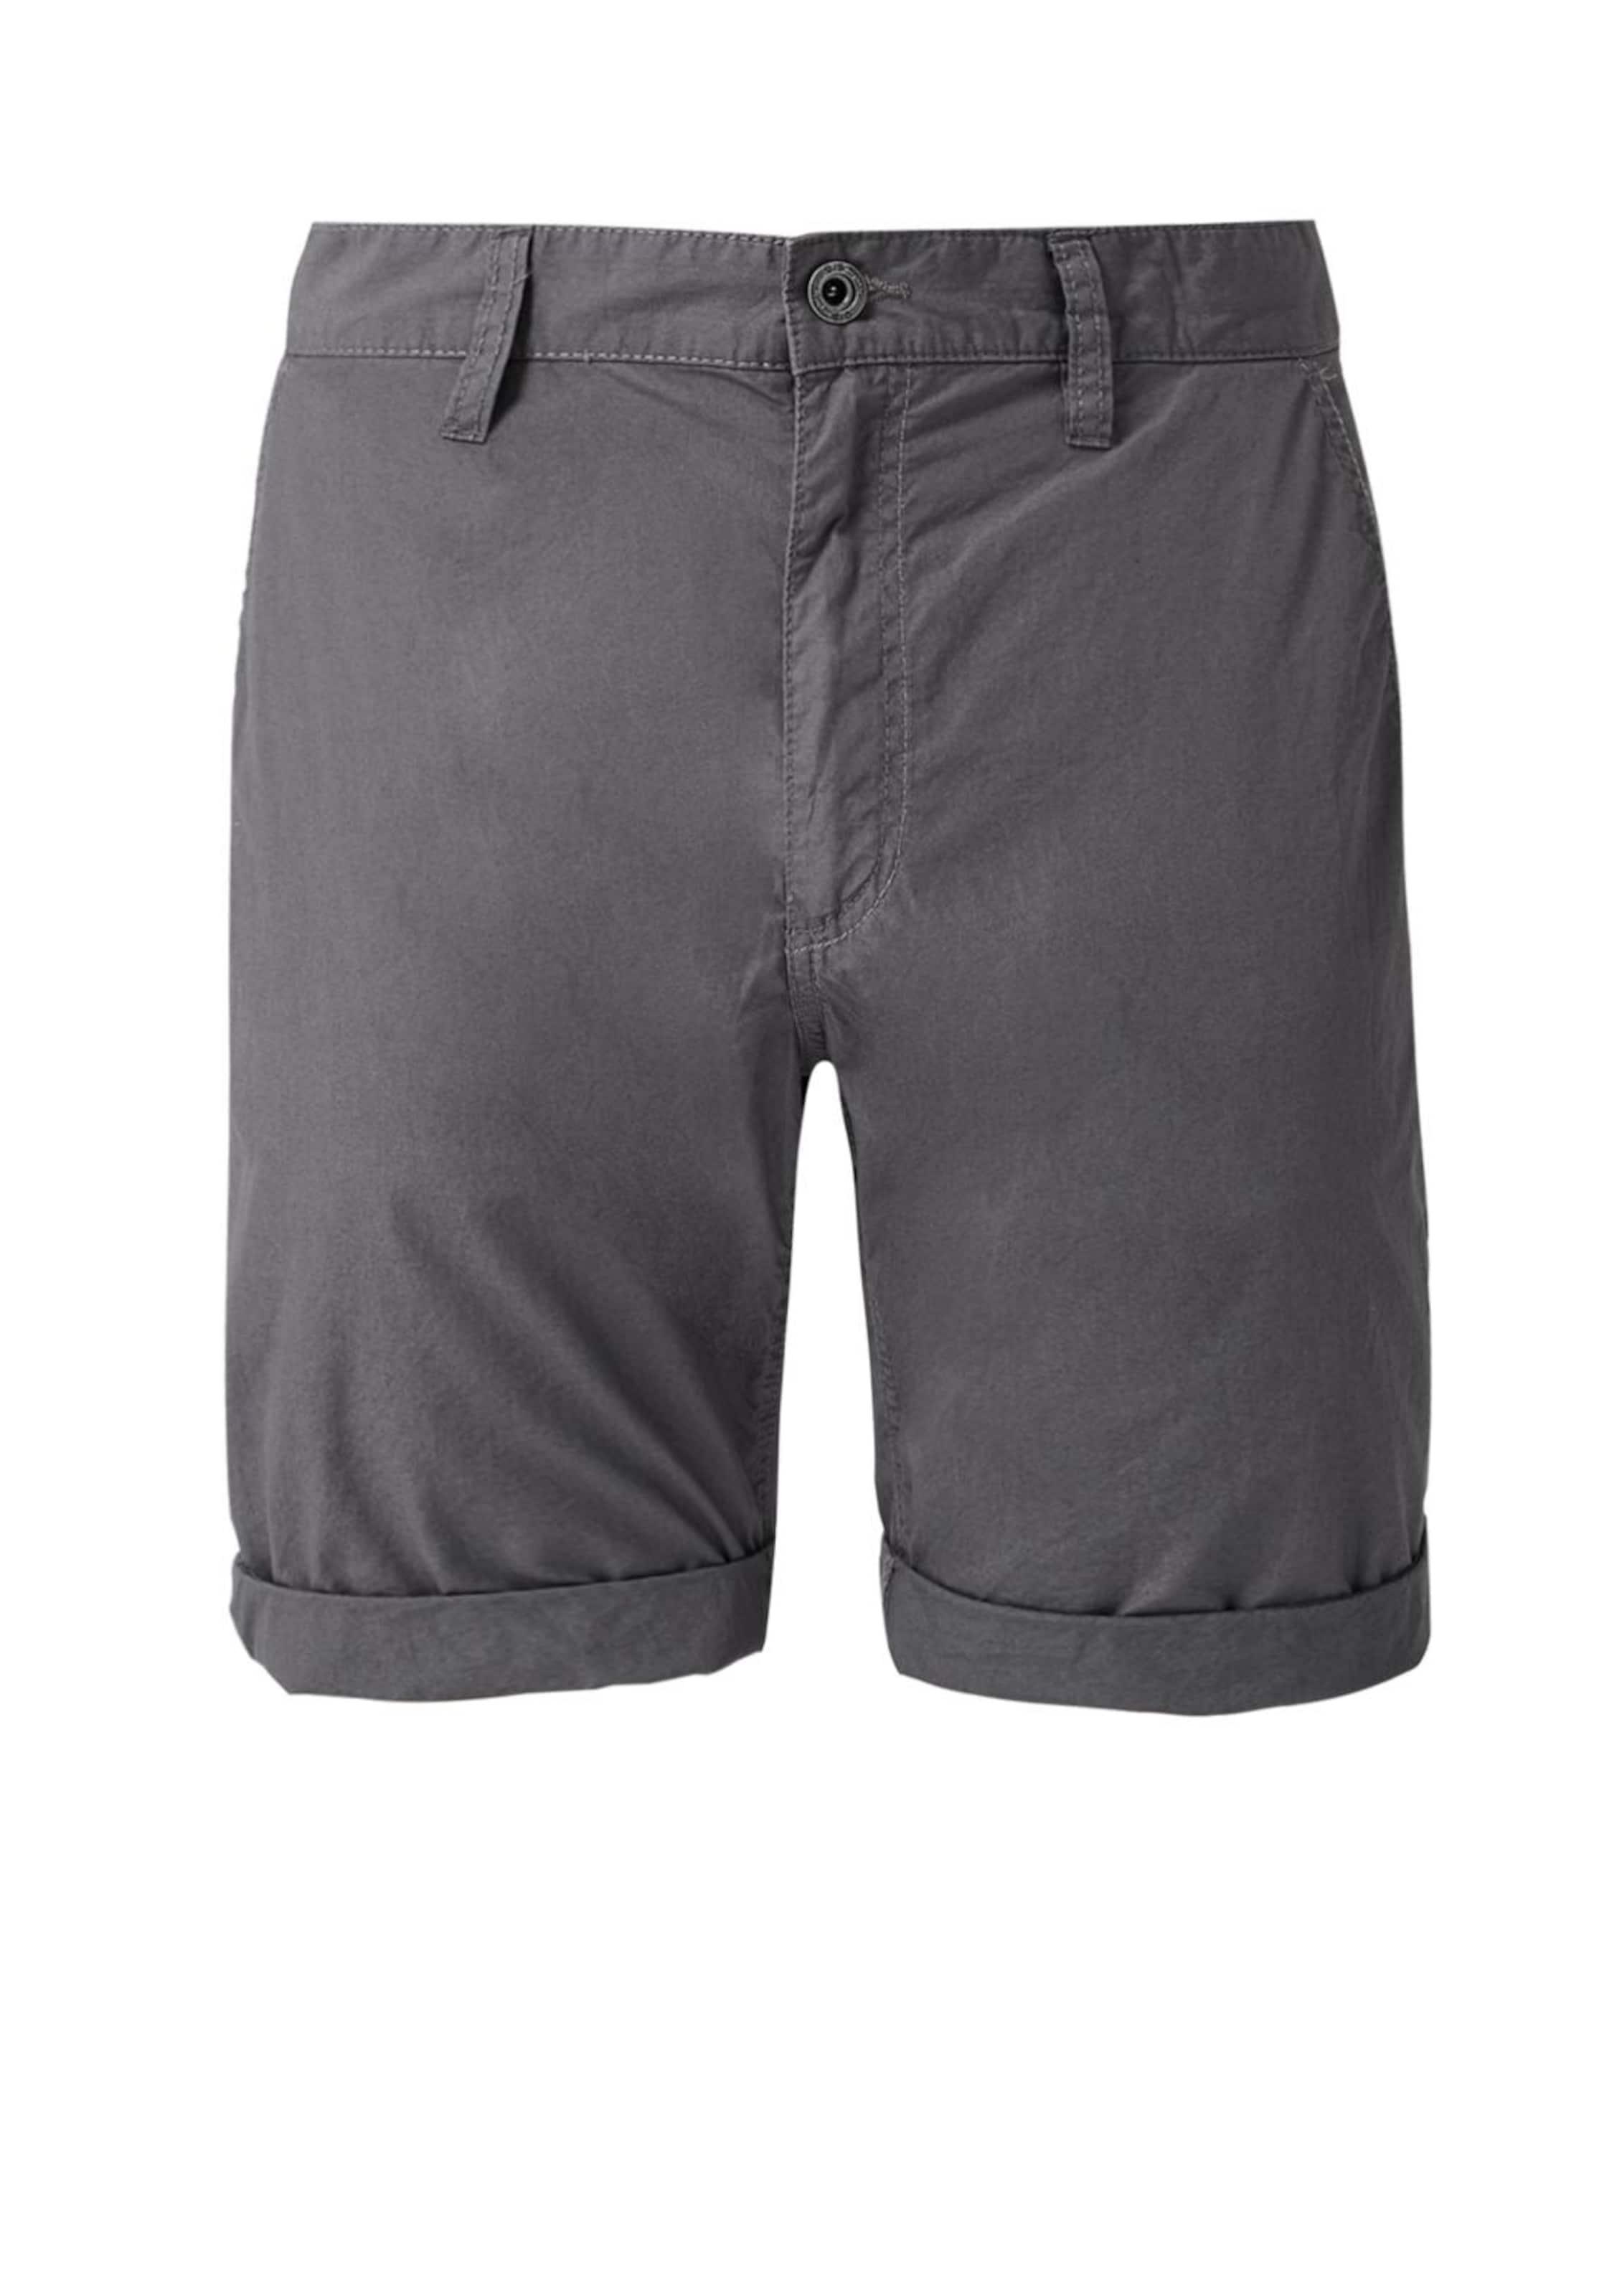 s Dunkelgrau In Designed By Shorts Q 'john' sxdBrthQC